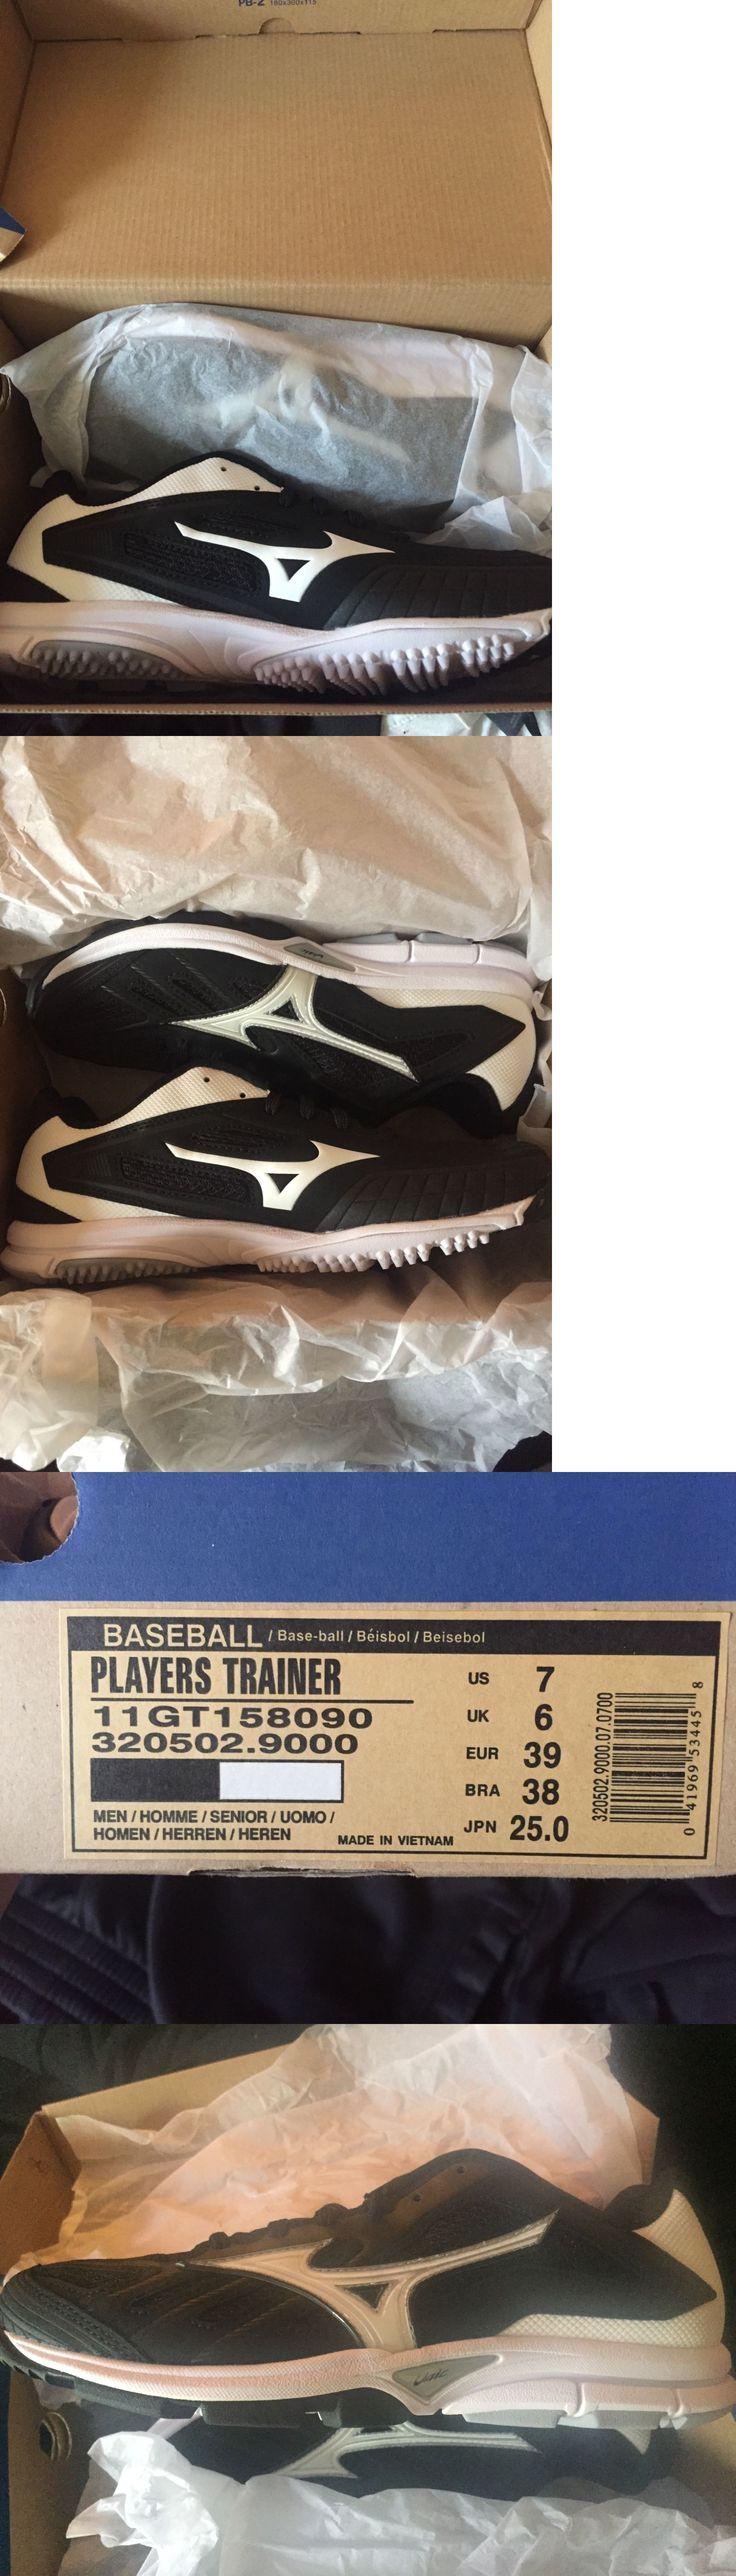 Mens 159059: Mizuno Player S Trainer Men S Baseball Turf Shoes Nib Black White Various Sizes -> BUY IT NOW ONLY: $54.99 on eBay!